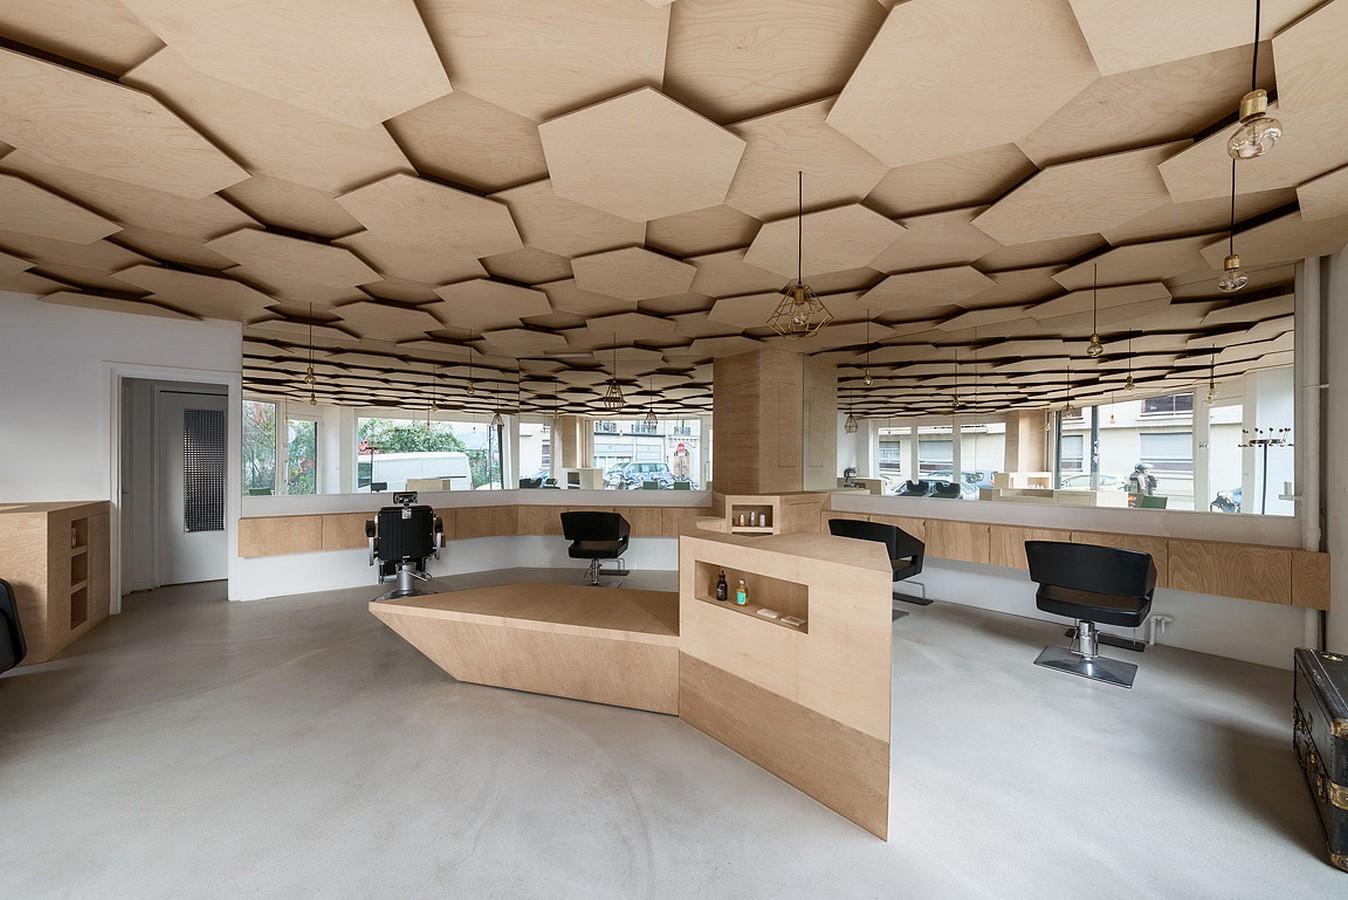 Joshua Florquin Architects